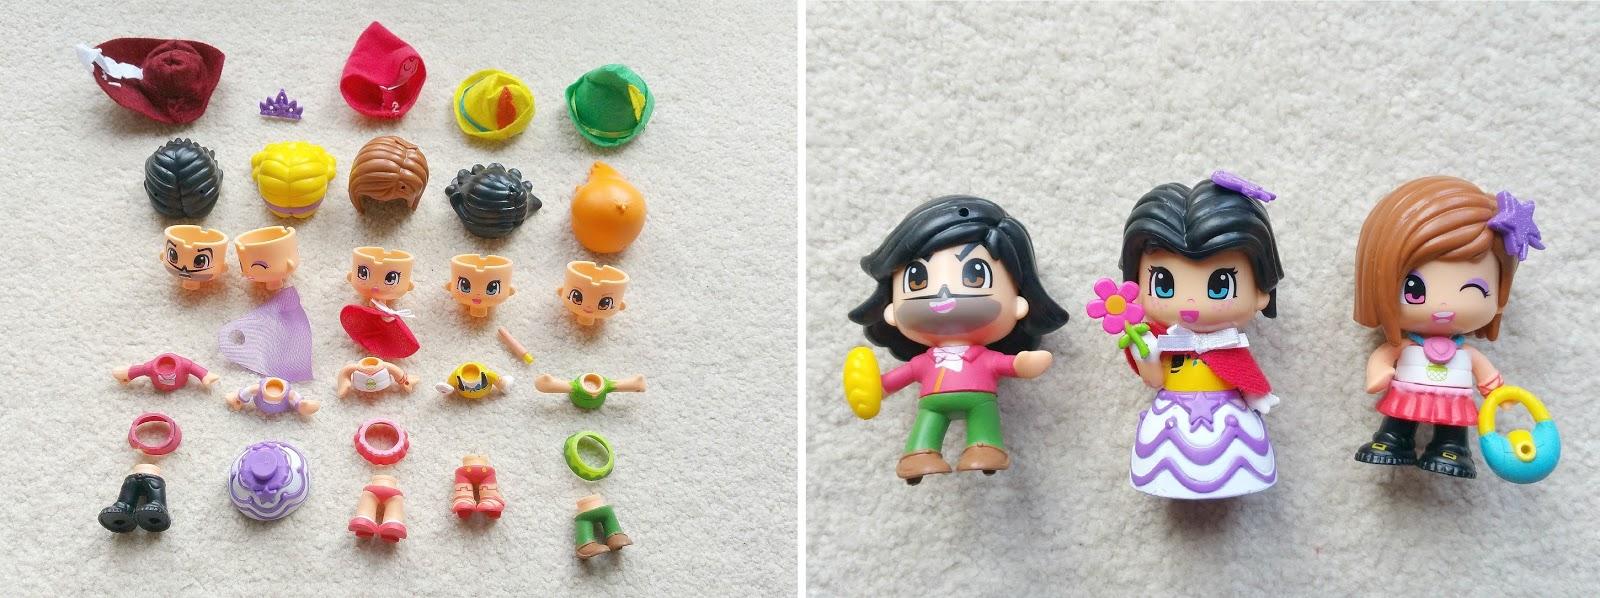 PinyPon Fairytale, Bandai toys, princess dolls